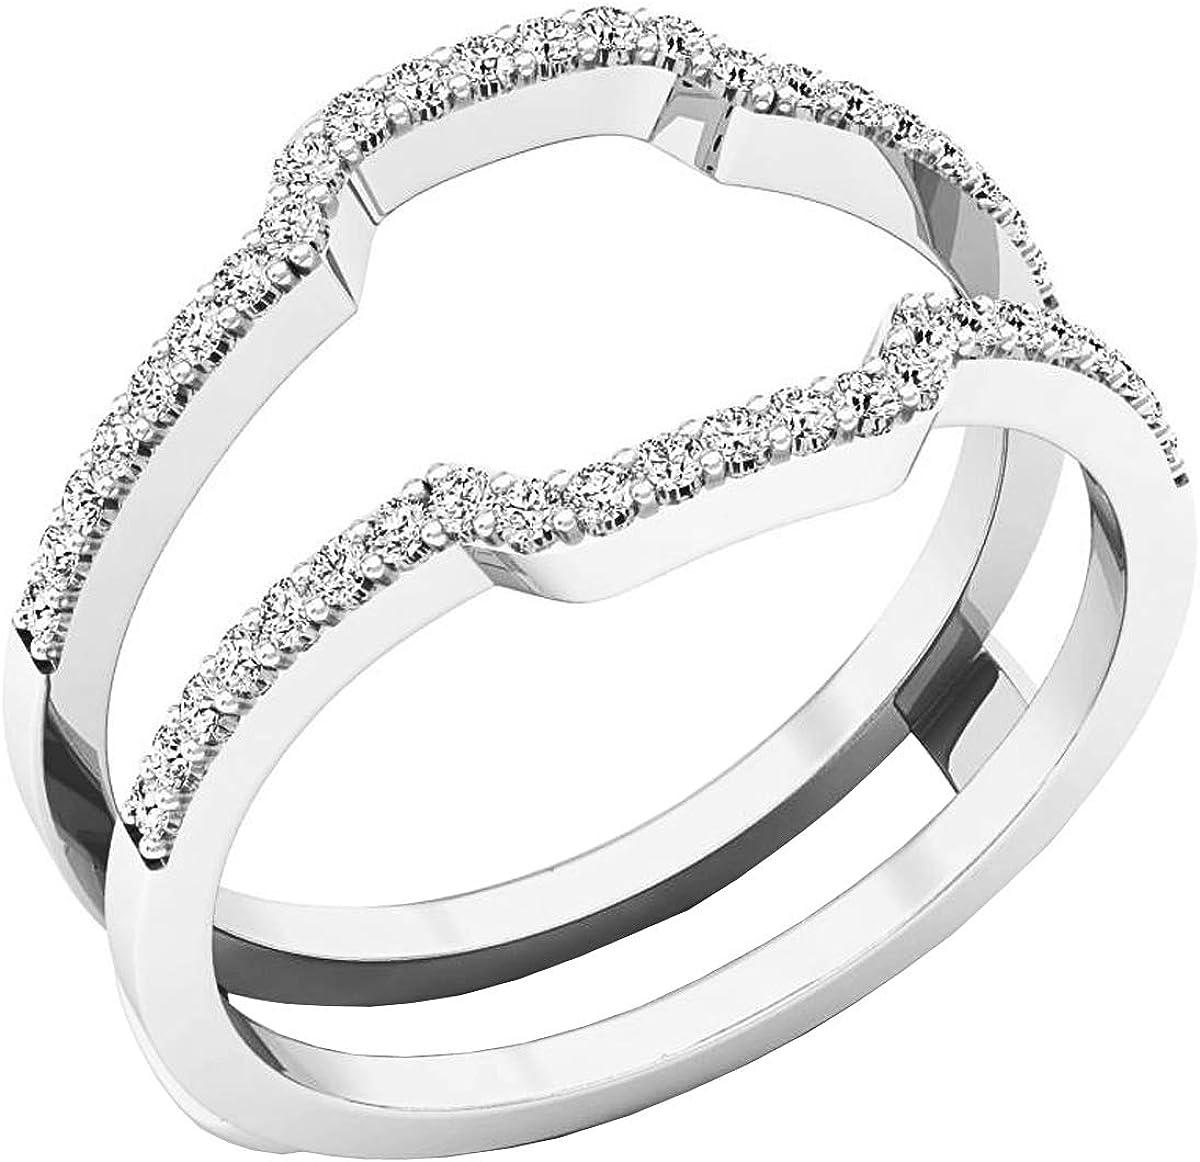 Dazzlingrock Collection Diamond Wedding Band Enhancer Guard Ring from 1/4 Carat to 1 Carat White Diamond Ring in 14K White Gold